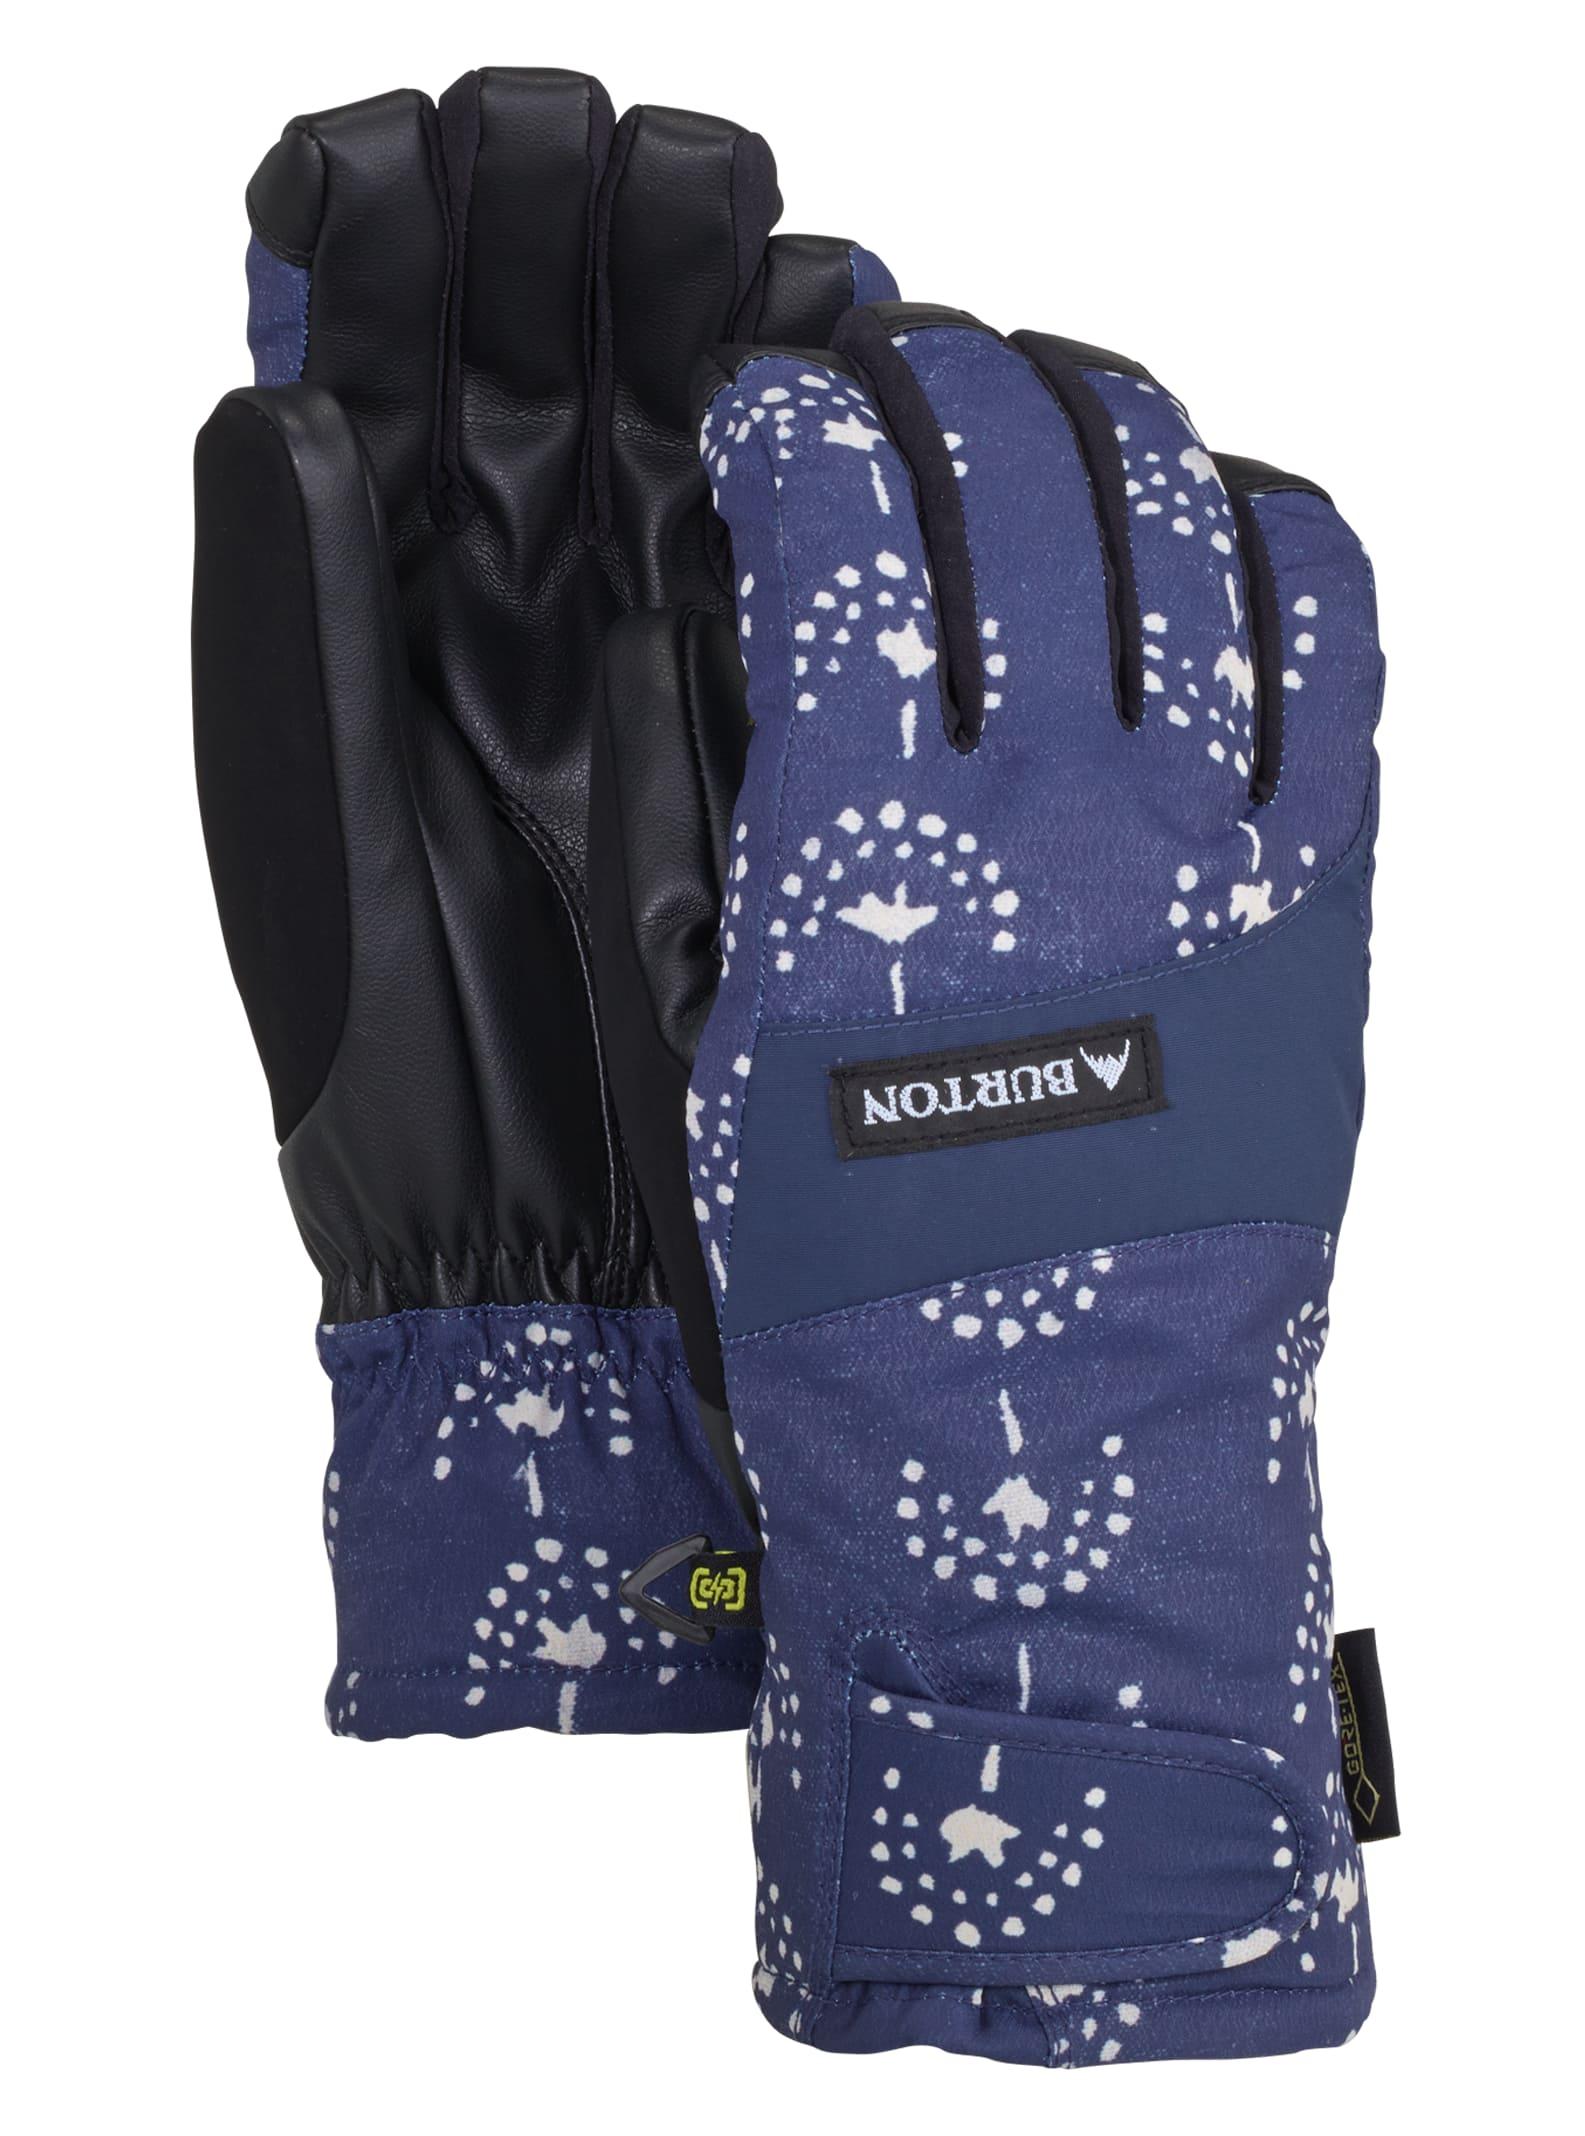 33053aeb6 Women s Burton Reverb GORE-TEX Glove